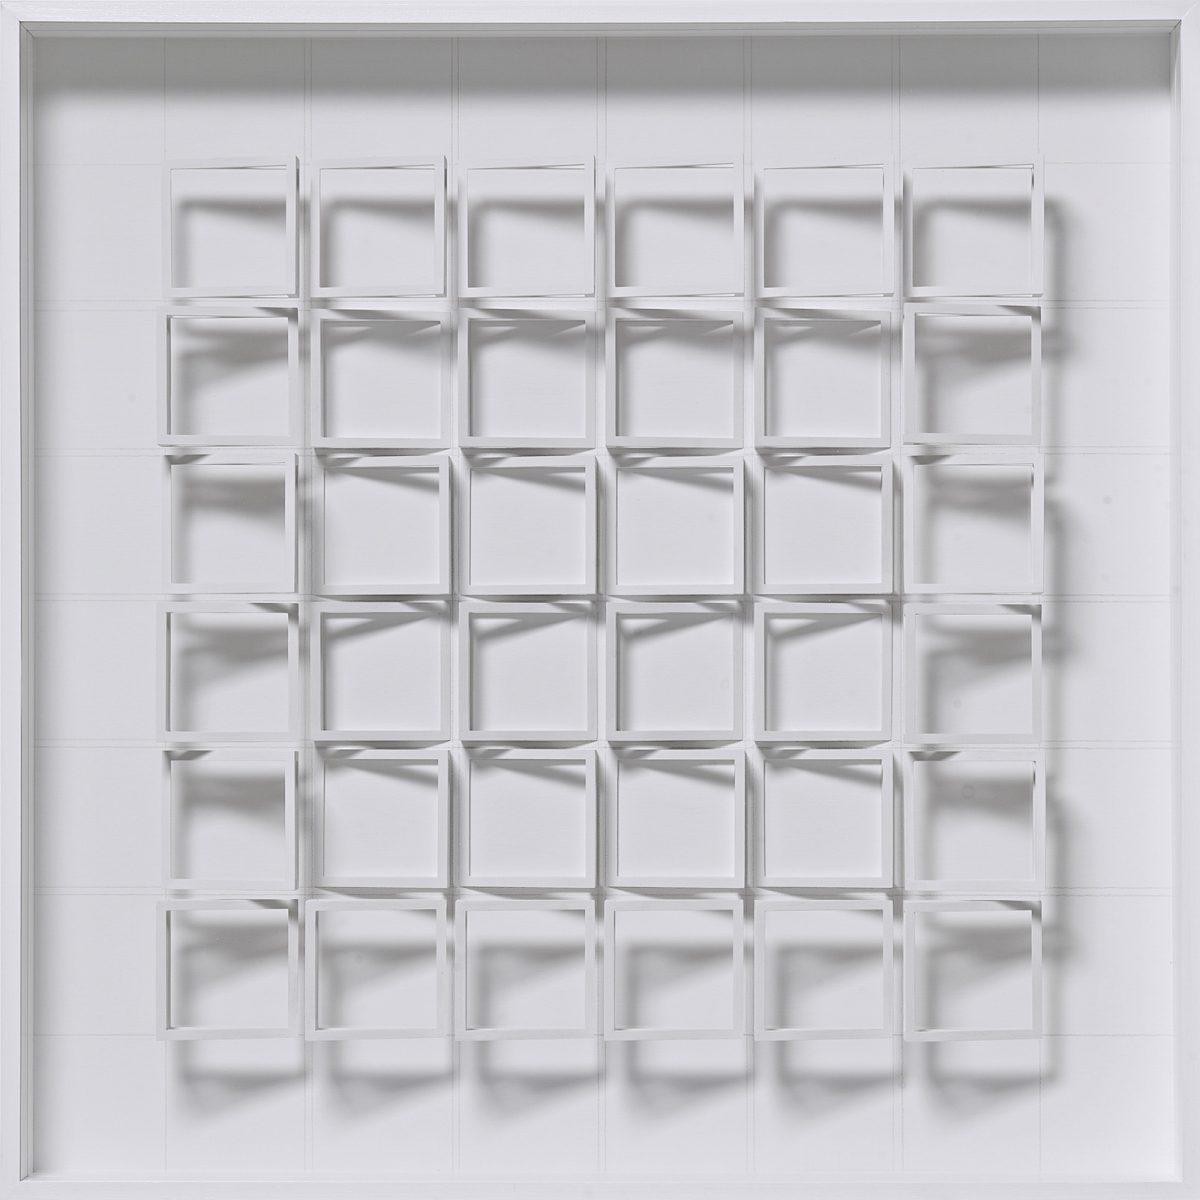 06 Klaus Staudt, Mitte, 2010, 72 x 72 x 10cm, Holz, Acrylfarbe, Plexiglas, Bleistift; Foto: Norbert Miguletz